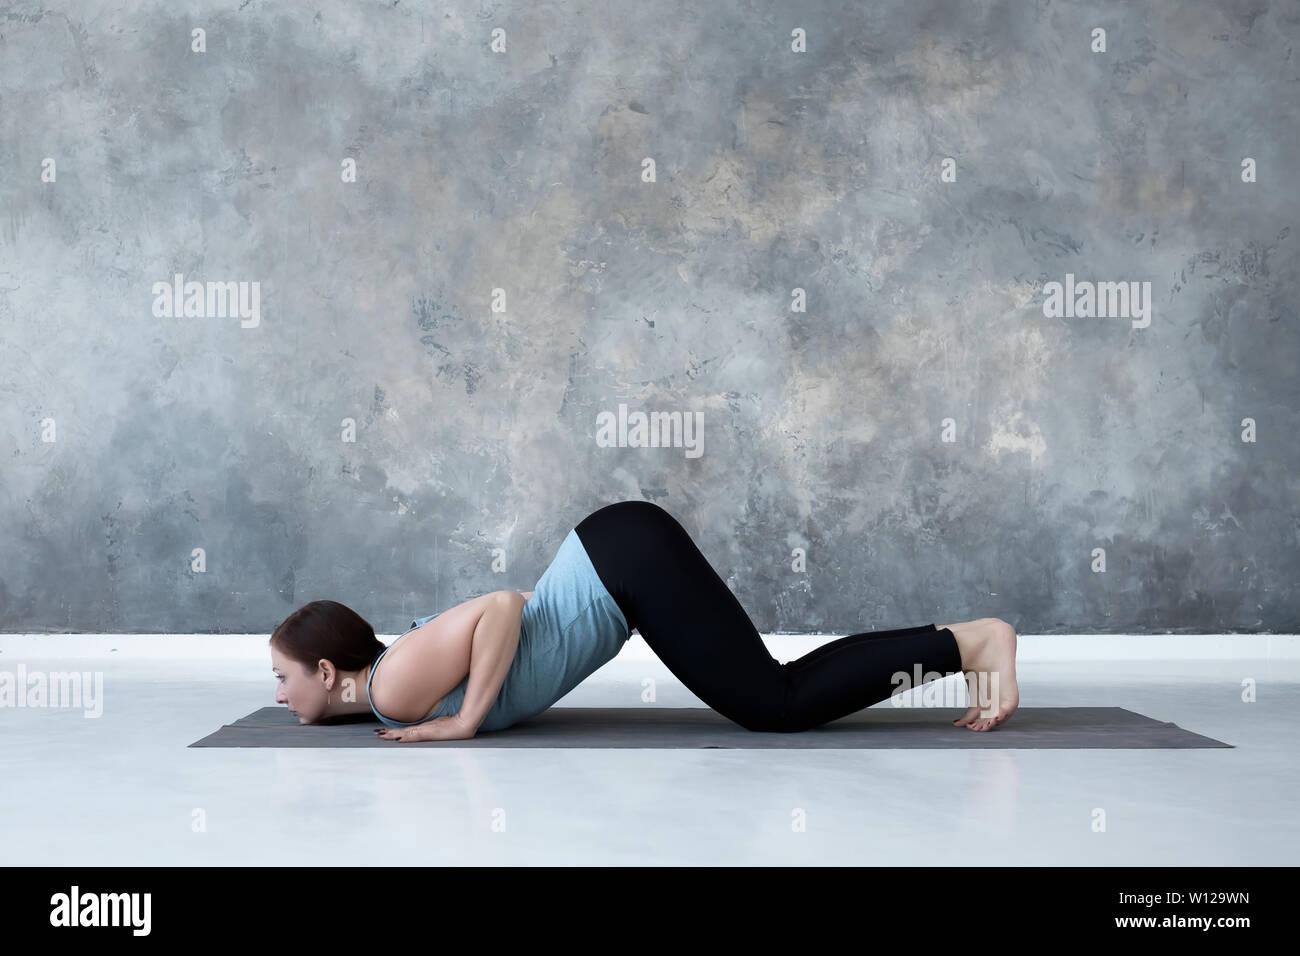 woman practicing yoga, doing Ashtanga Namaskara from Sun salutation. - Stock Image